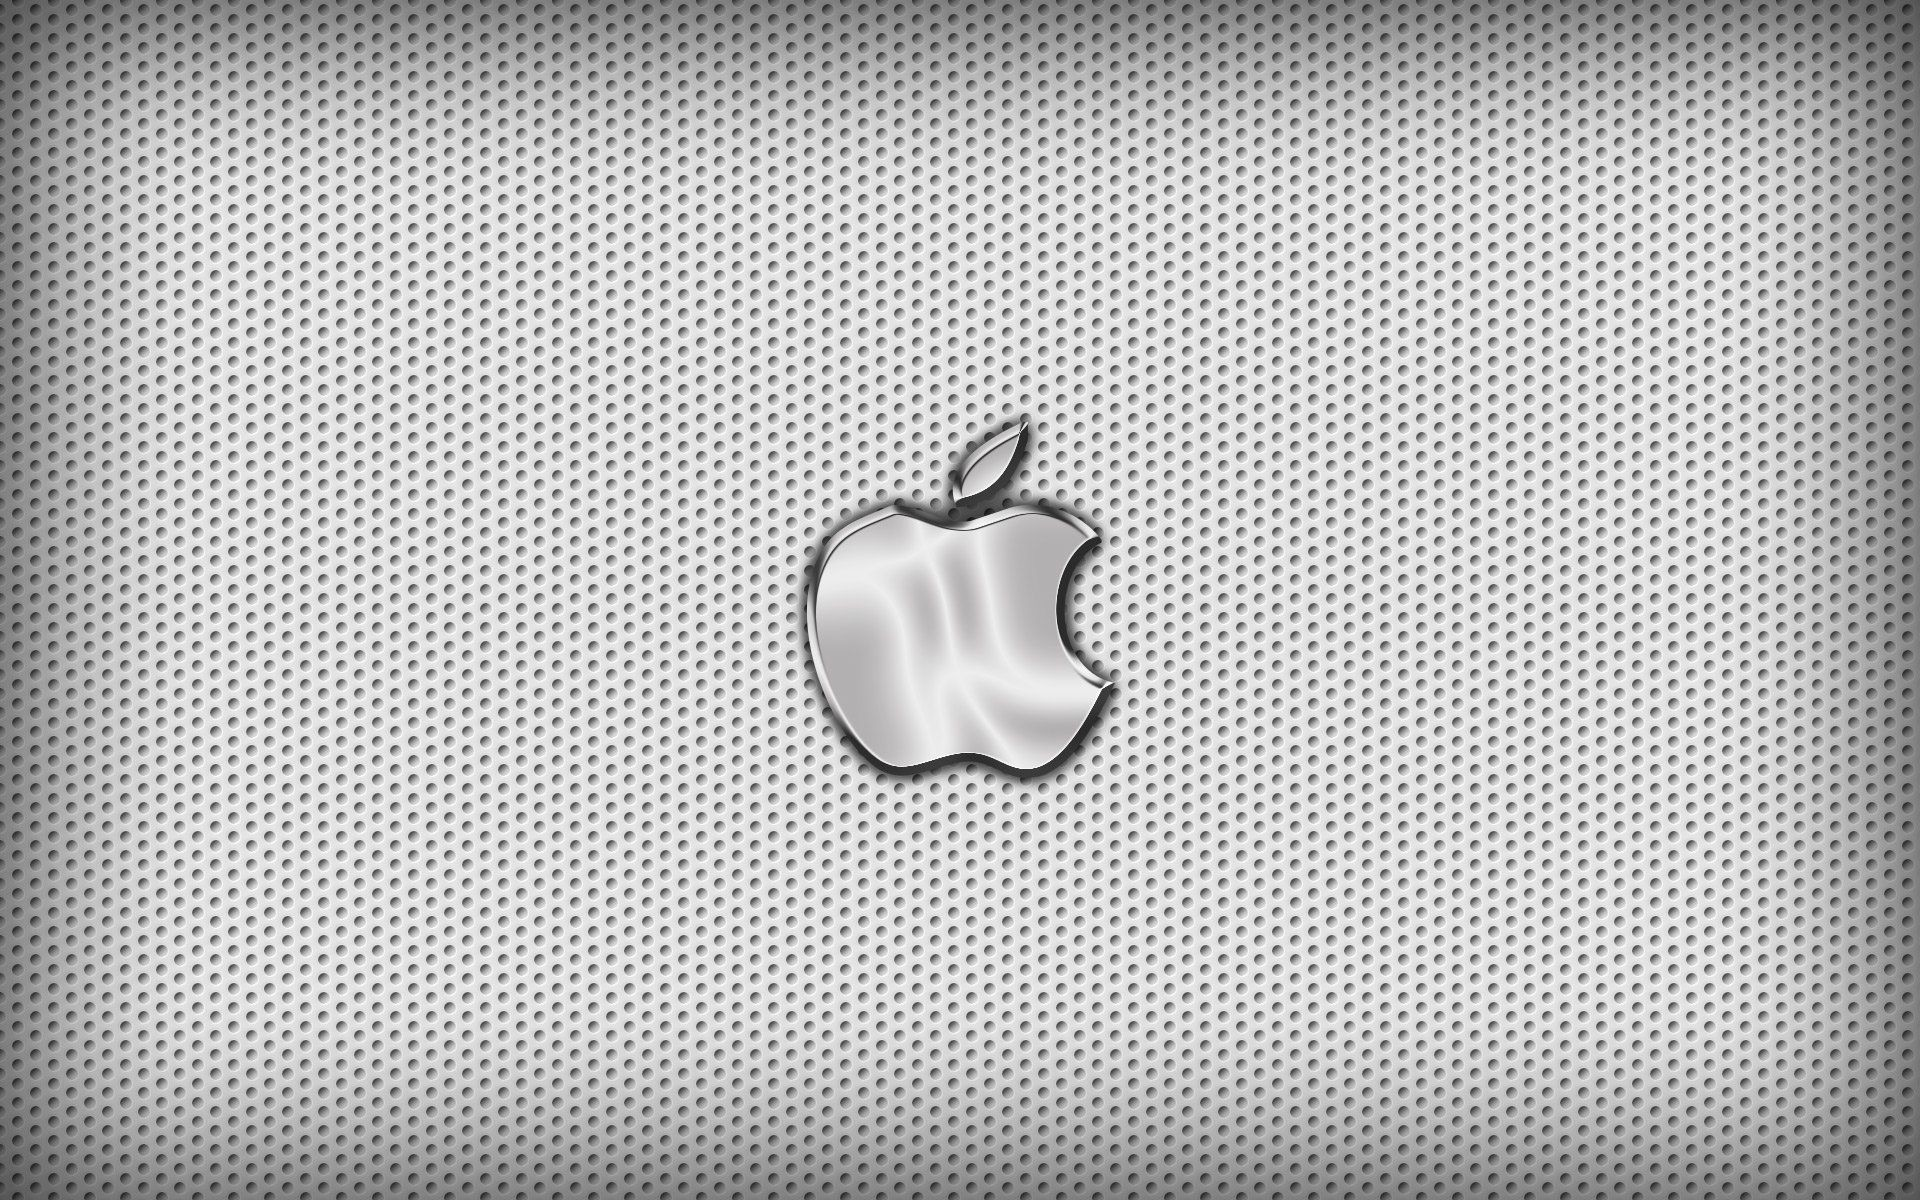 Mac Wallpapers Seattle Desktop Background Wallpaper Technology .